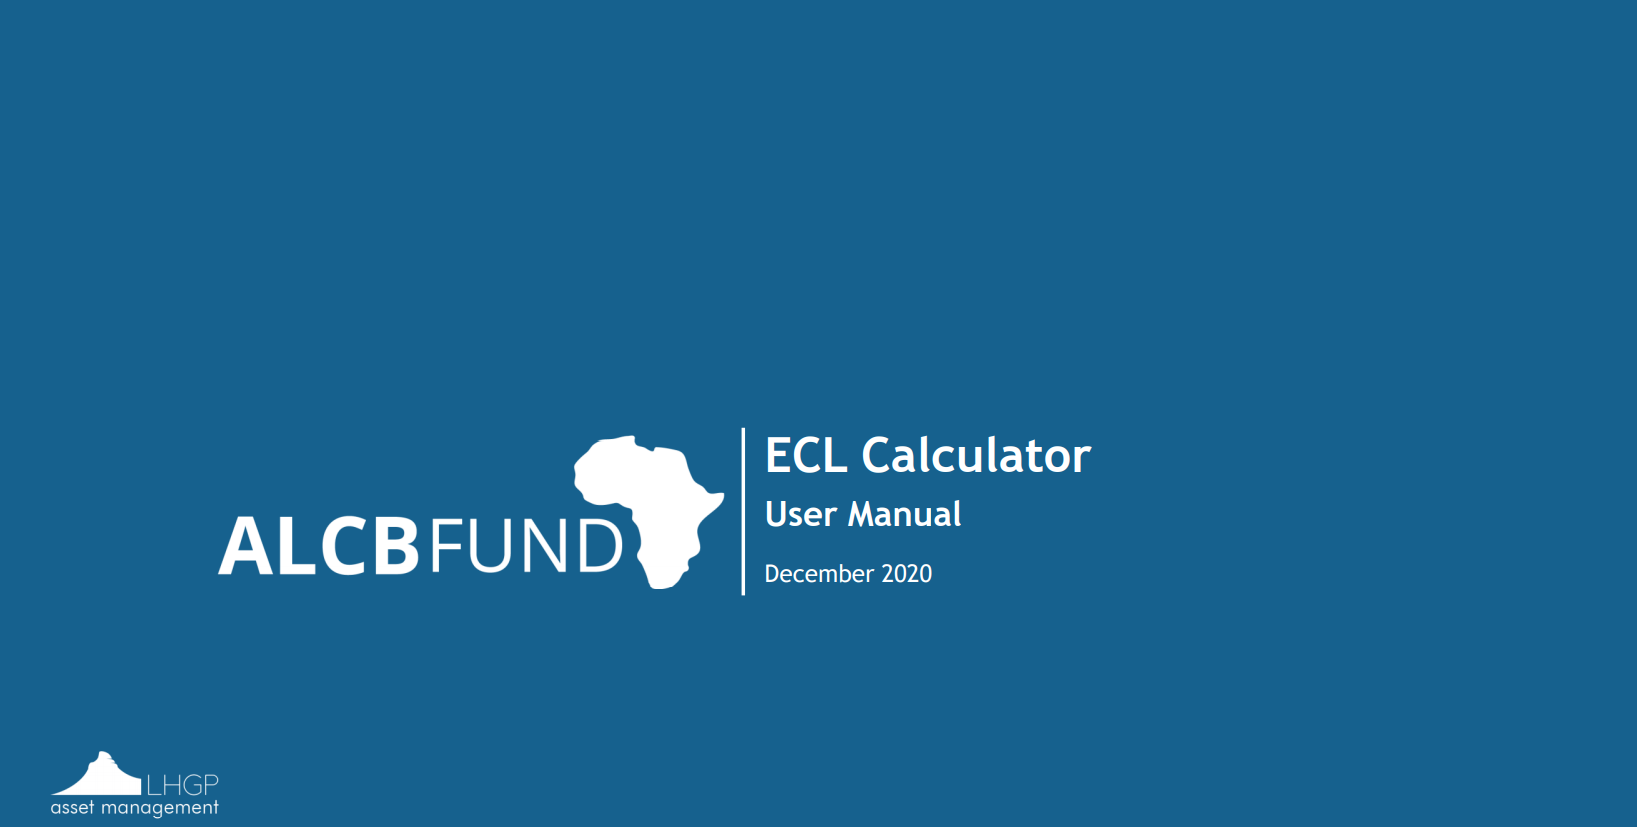 ECL Calculator - User Manual